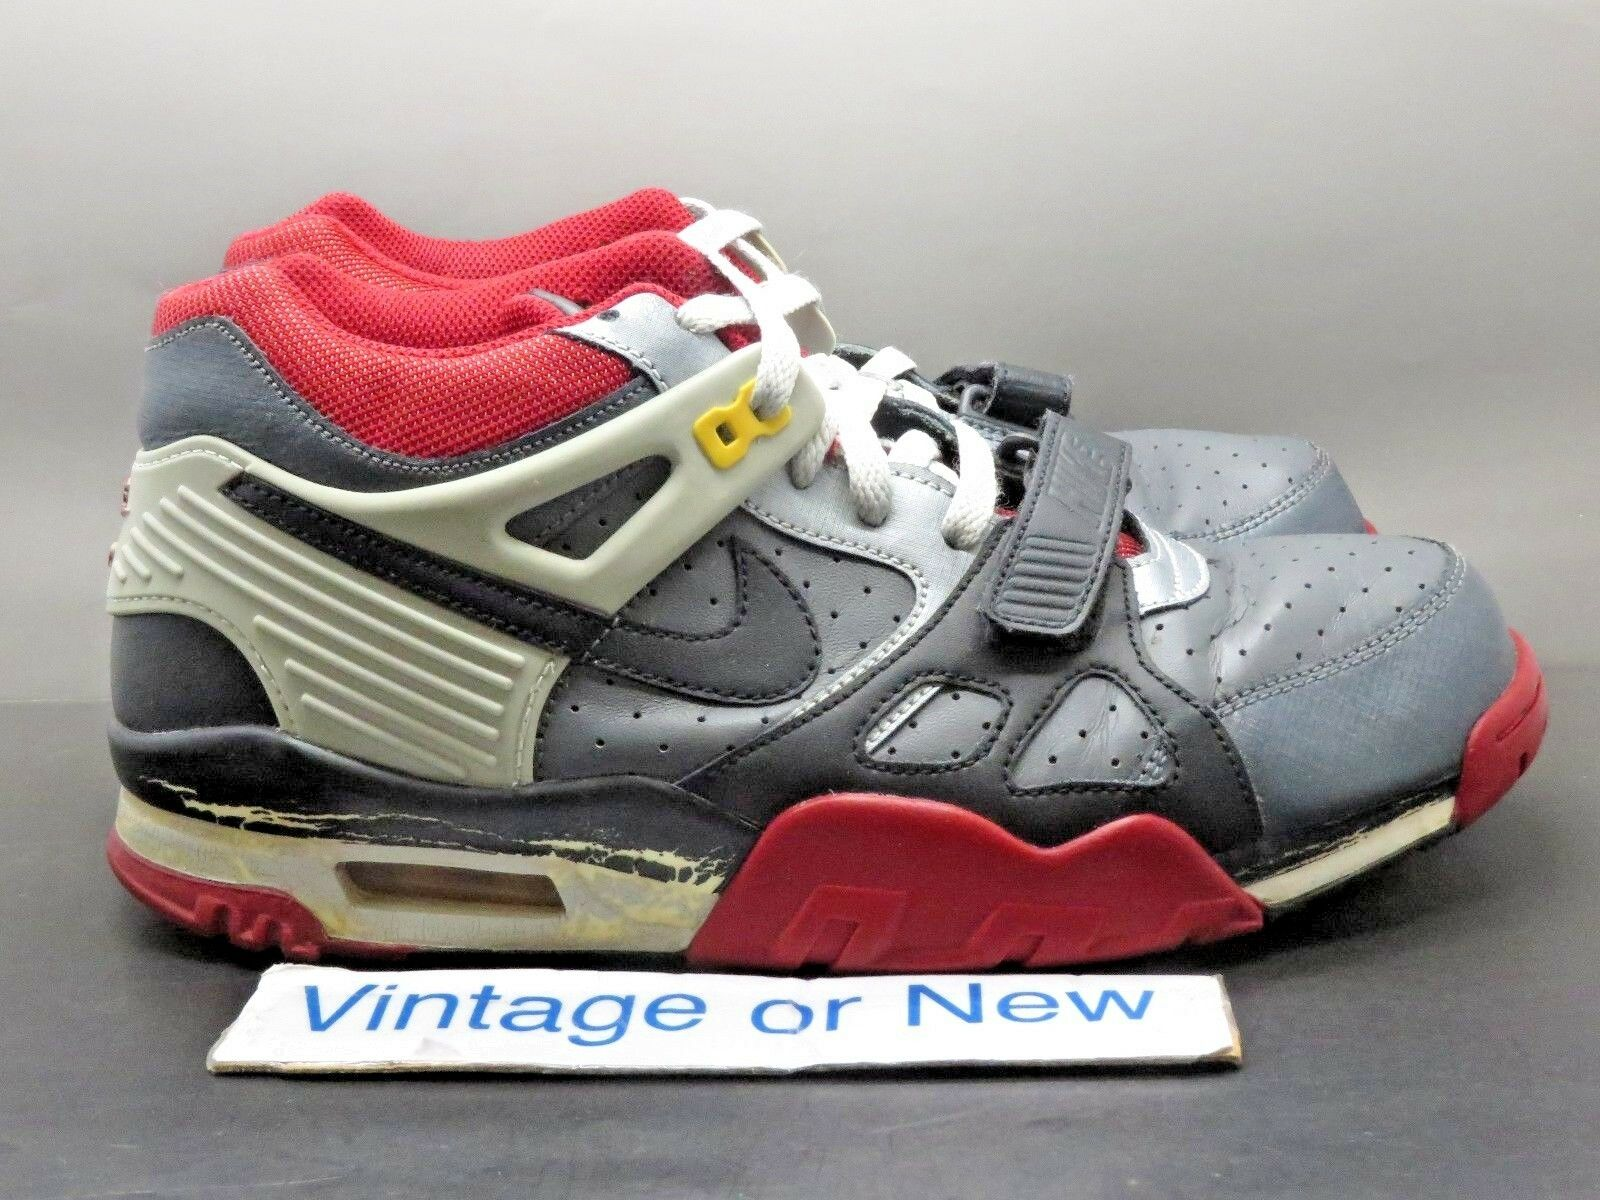 Nike air trainer 3 iii grigio scuro nero, grigio - rosso neutro bo jackson 2009 sz - 9